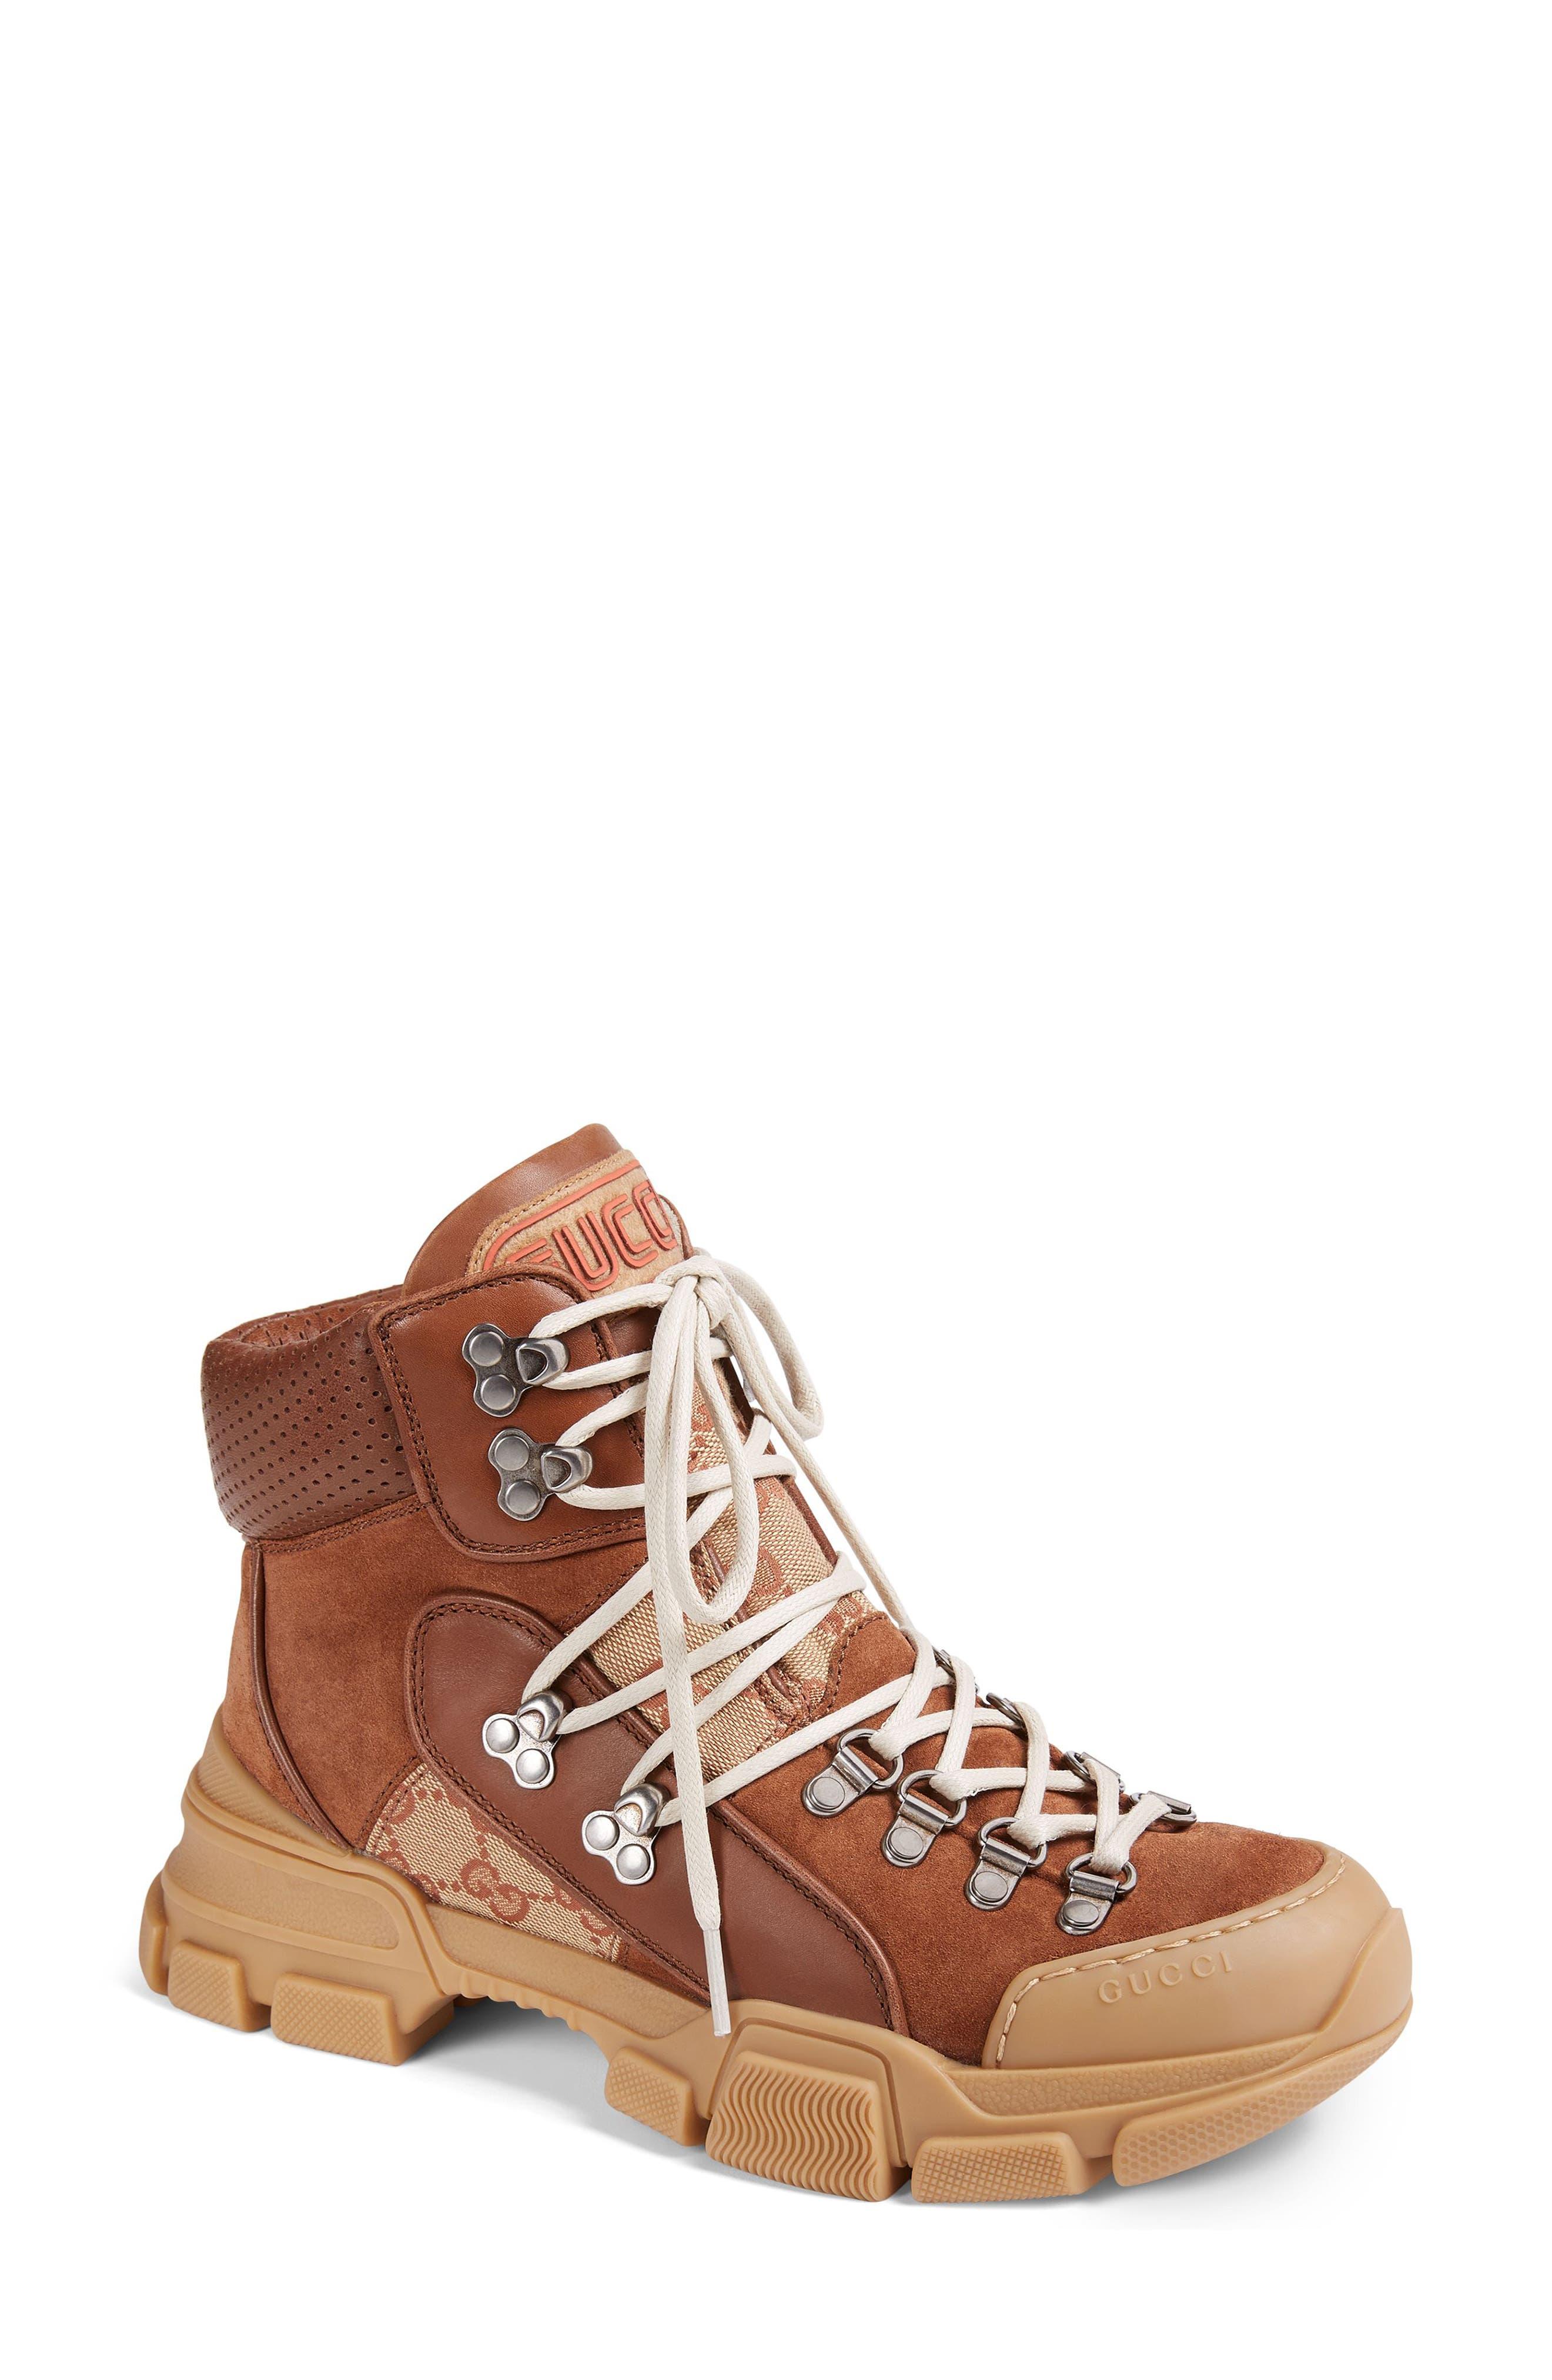 c43f75424b4 Women s Gucci Boots